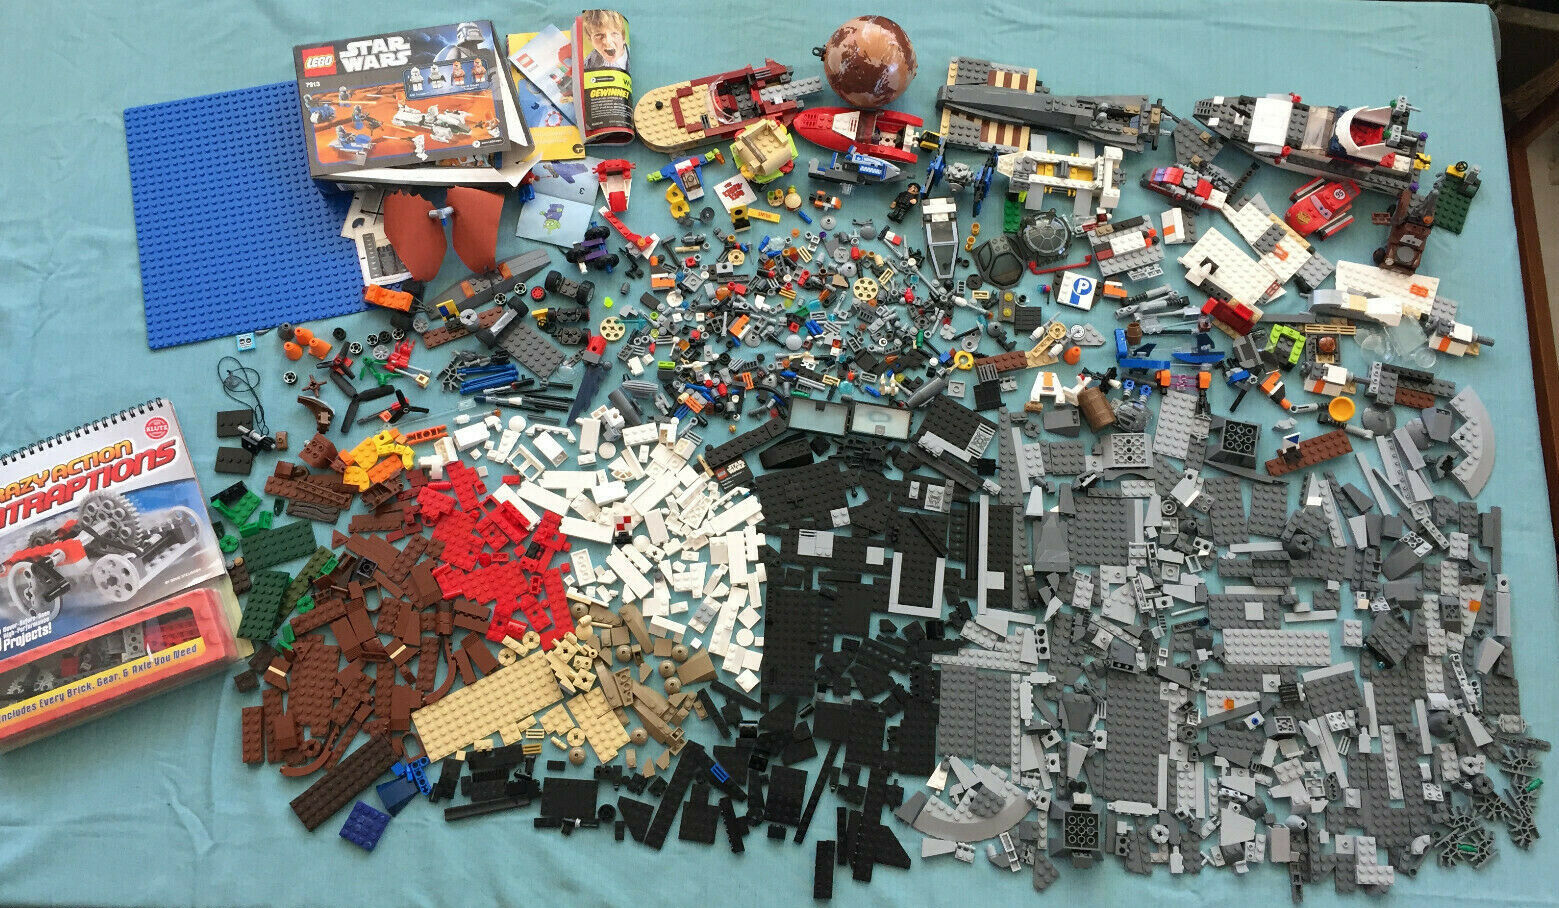 10+ Pounds of Legos Assorted Pieces Star Wars Spongebob City...10 LB